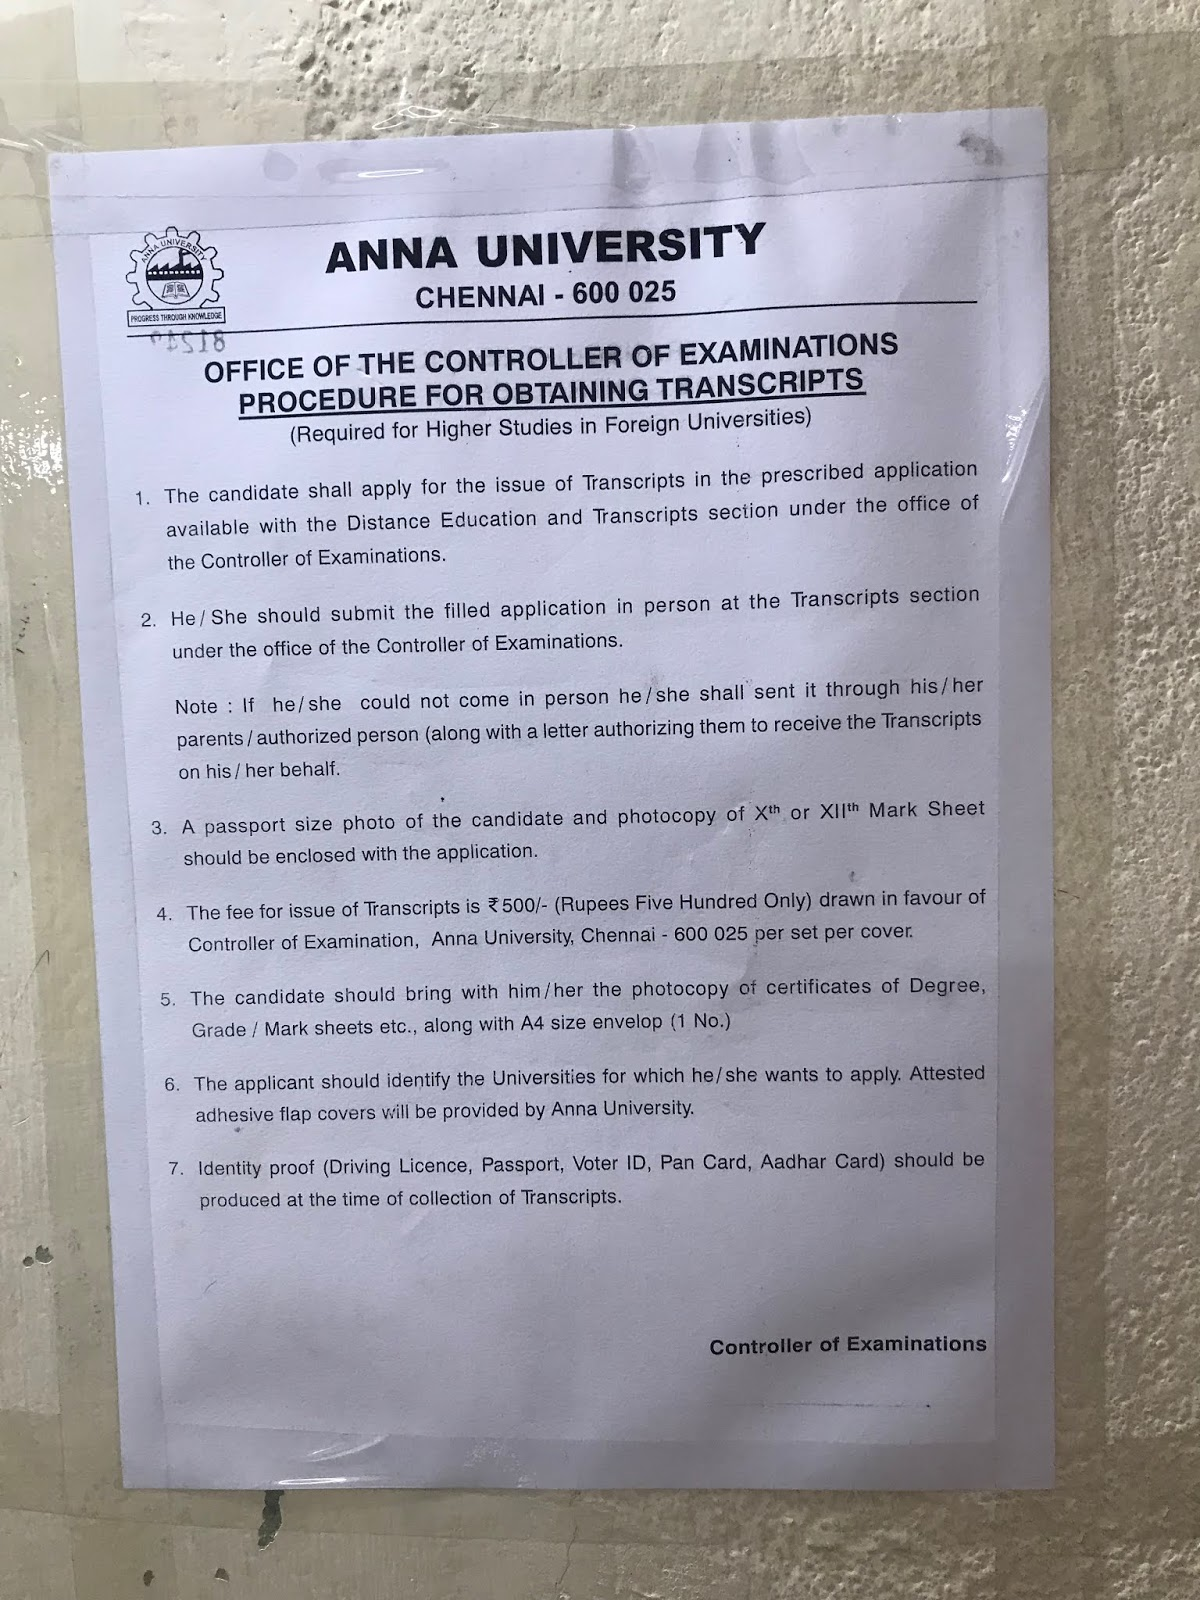 WES Transcript application procedure for Anna University ~ Blog of Plots